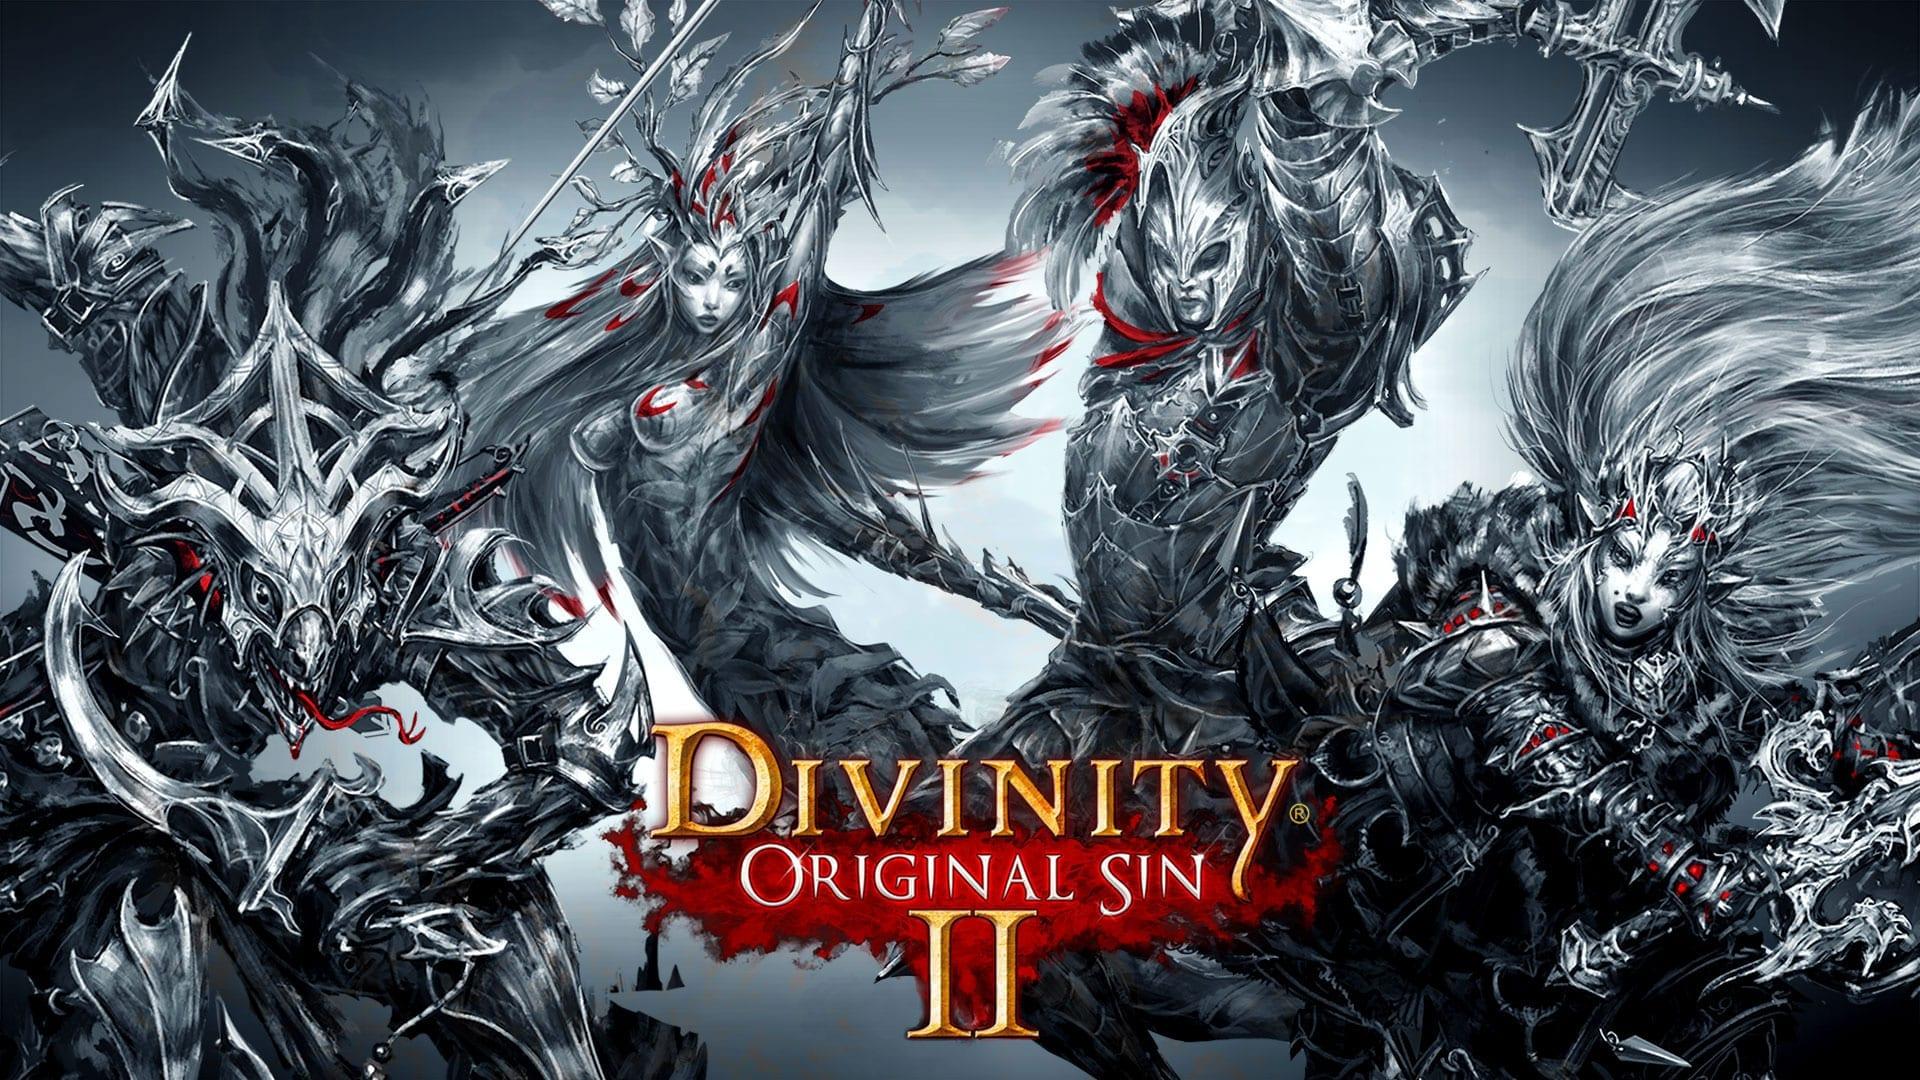 Divinity: Original Sin 2 - logo - art - banner